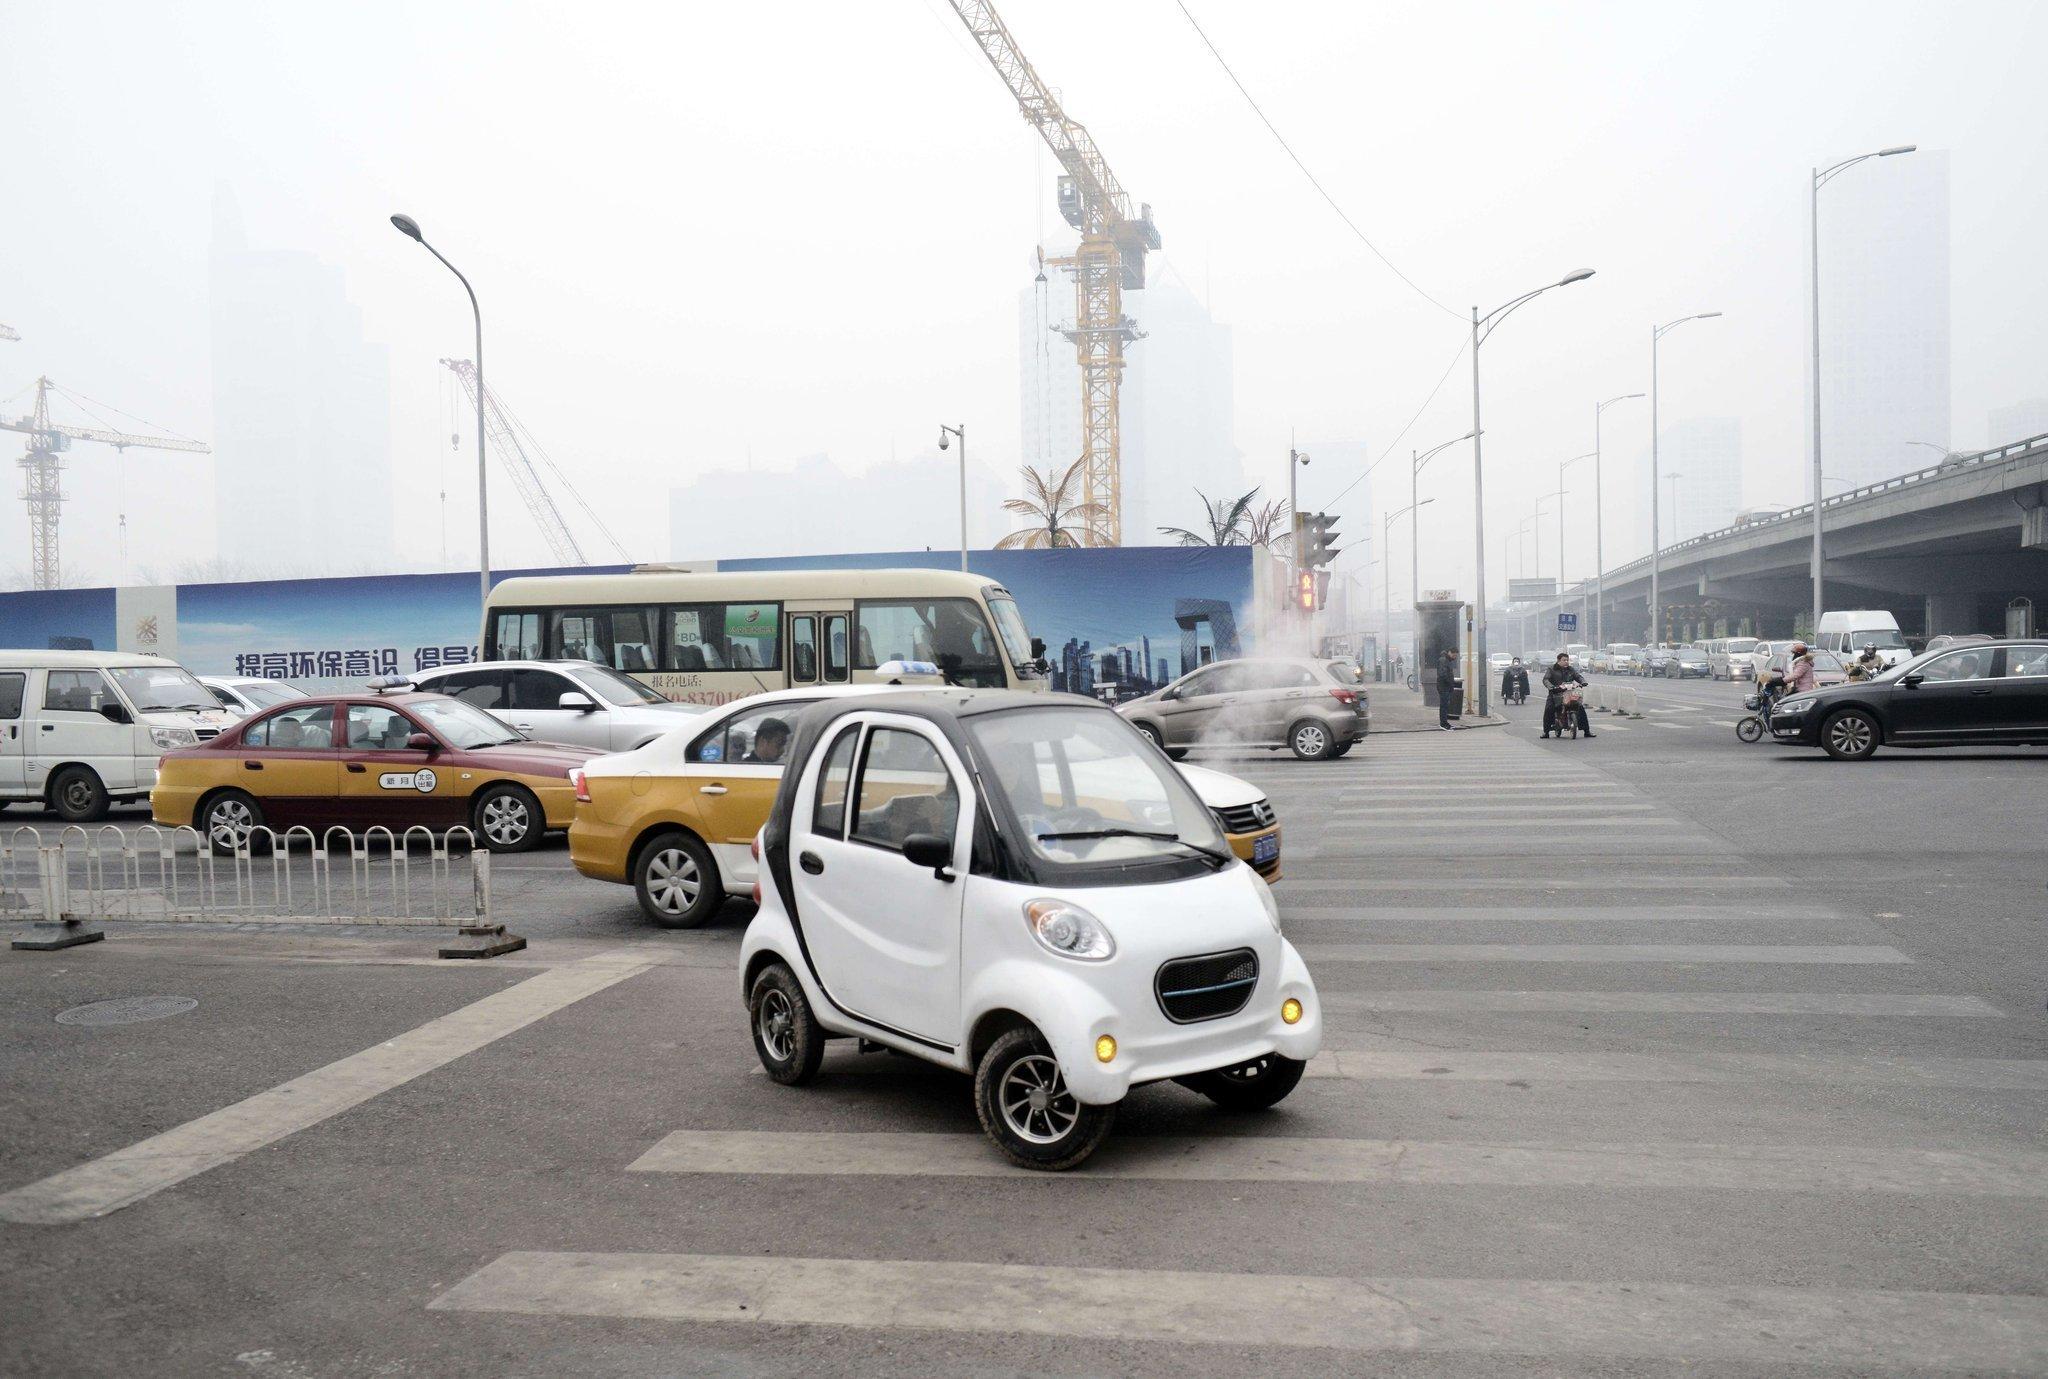 china 39 s electric car lesson la times. Black Bedroom Furniture Sets. Home Design Ideas